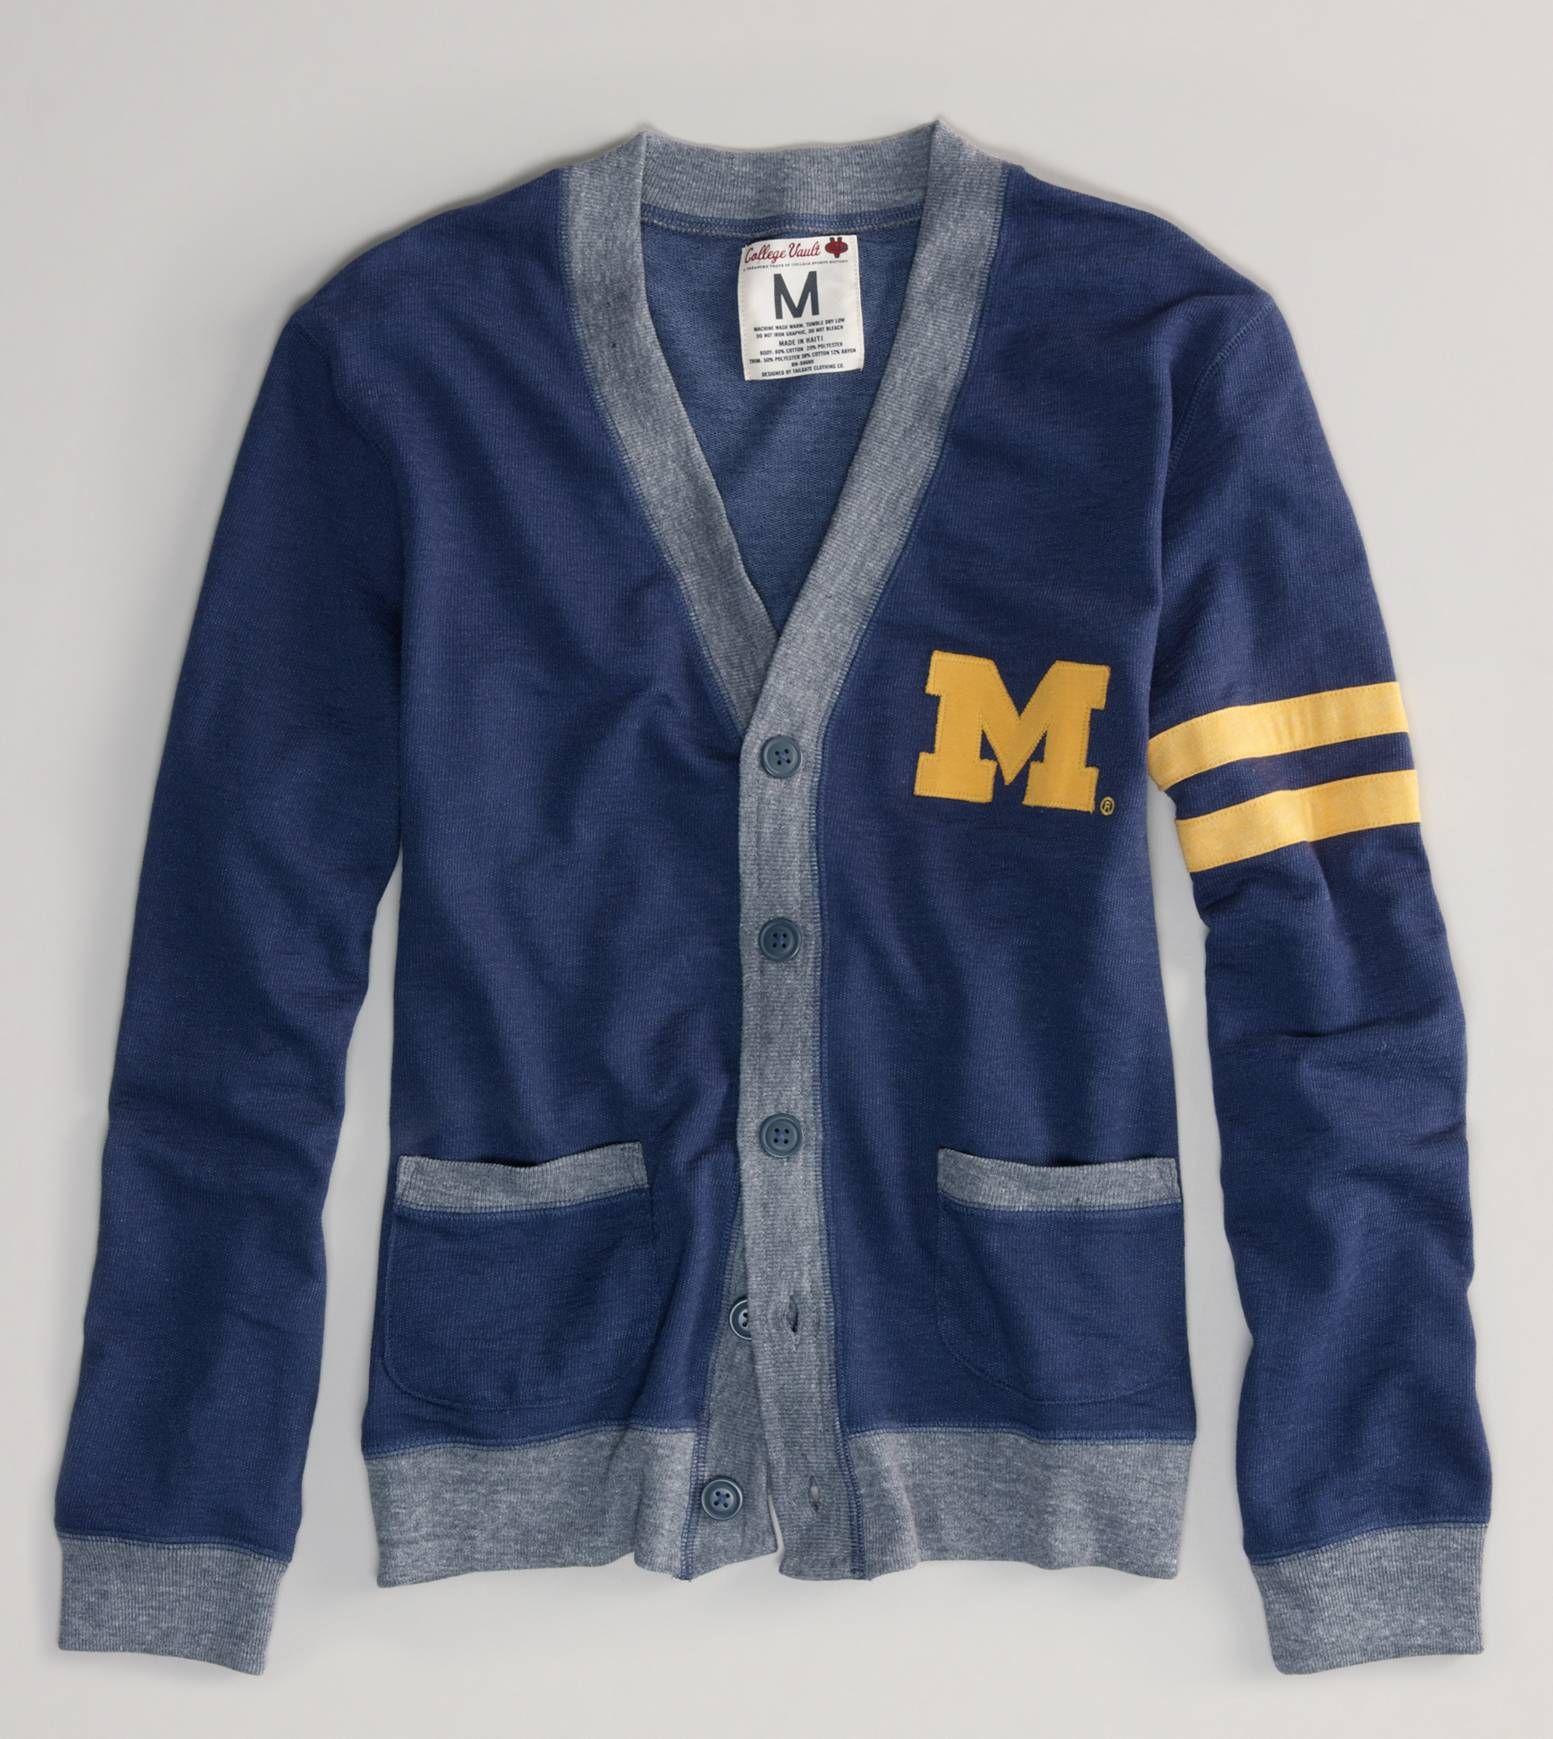 ffbfacc7 Vintage Michigan Cardigan // American Eagle Outfitters // $49.95 GO BLUE!